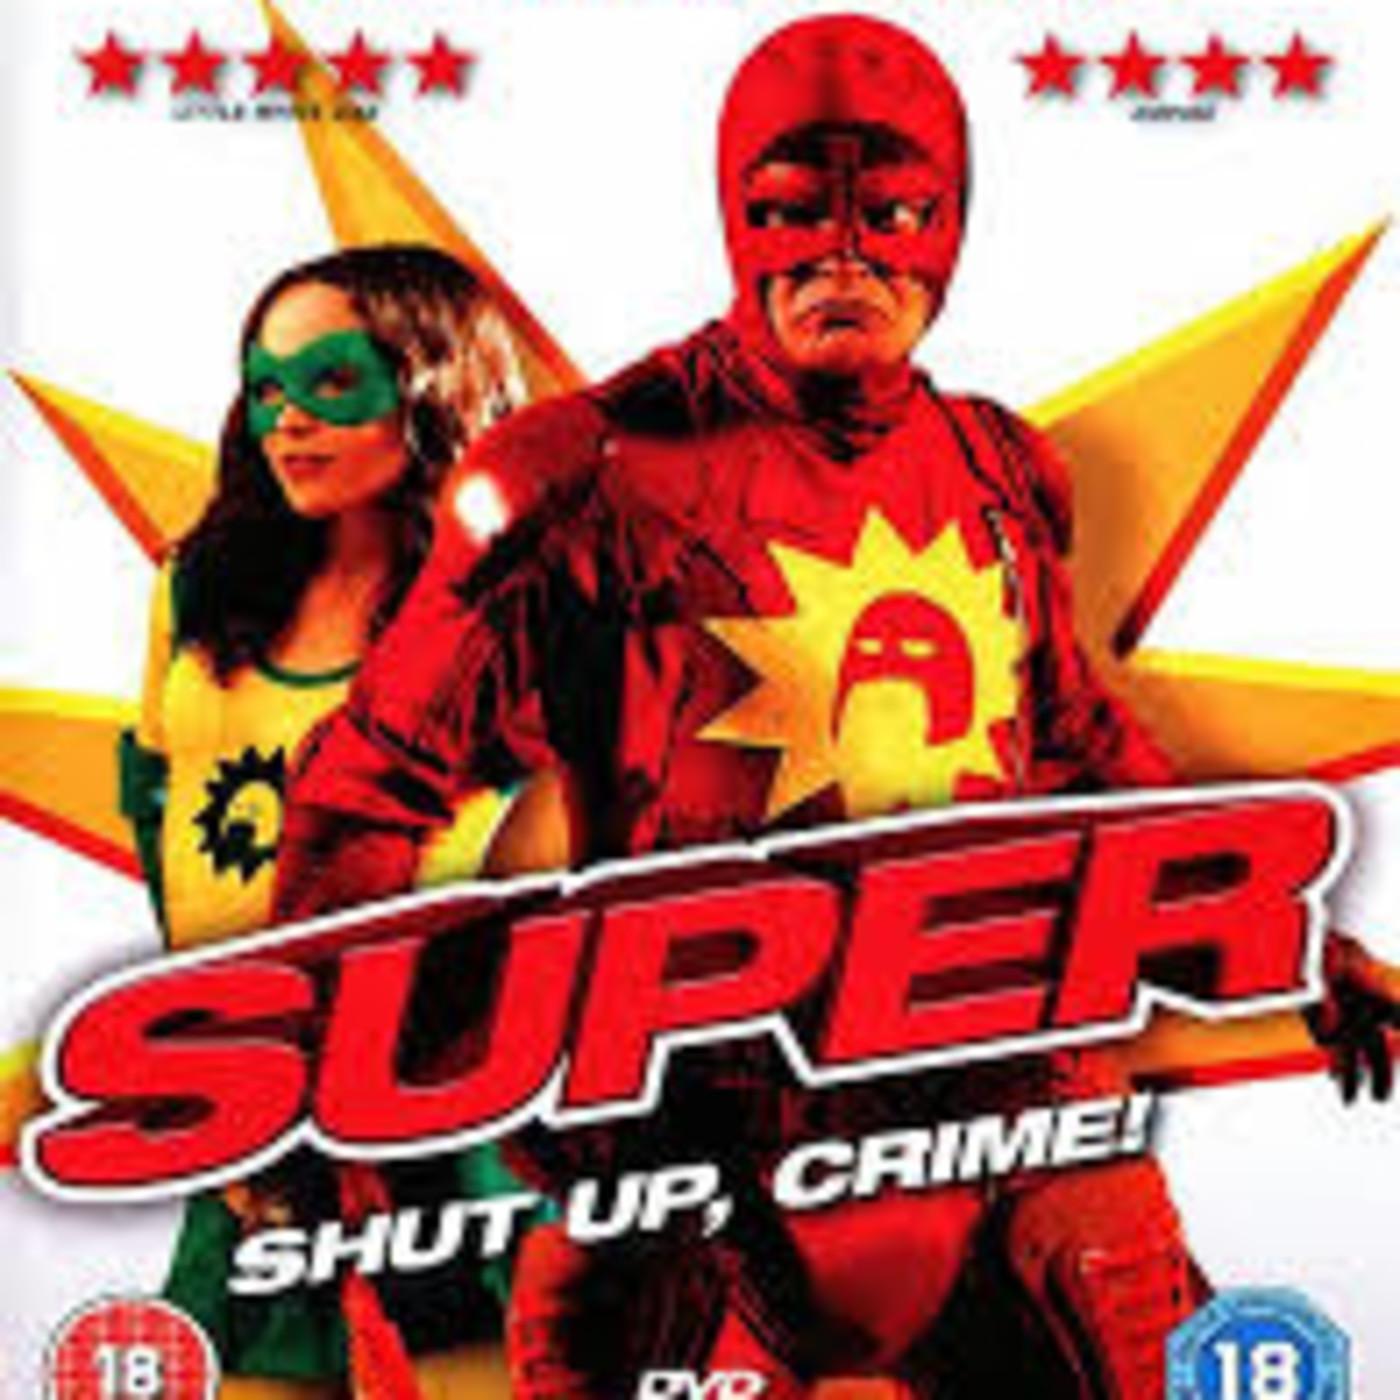 Super (2010, James Gunn)